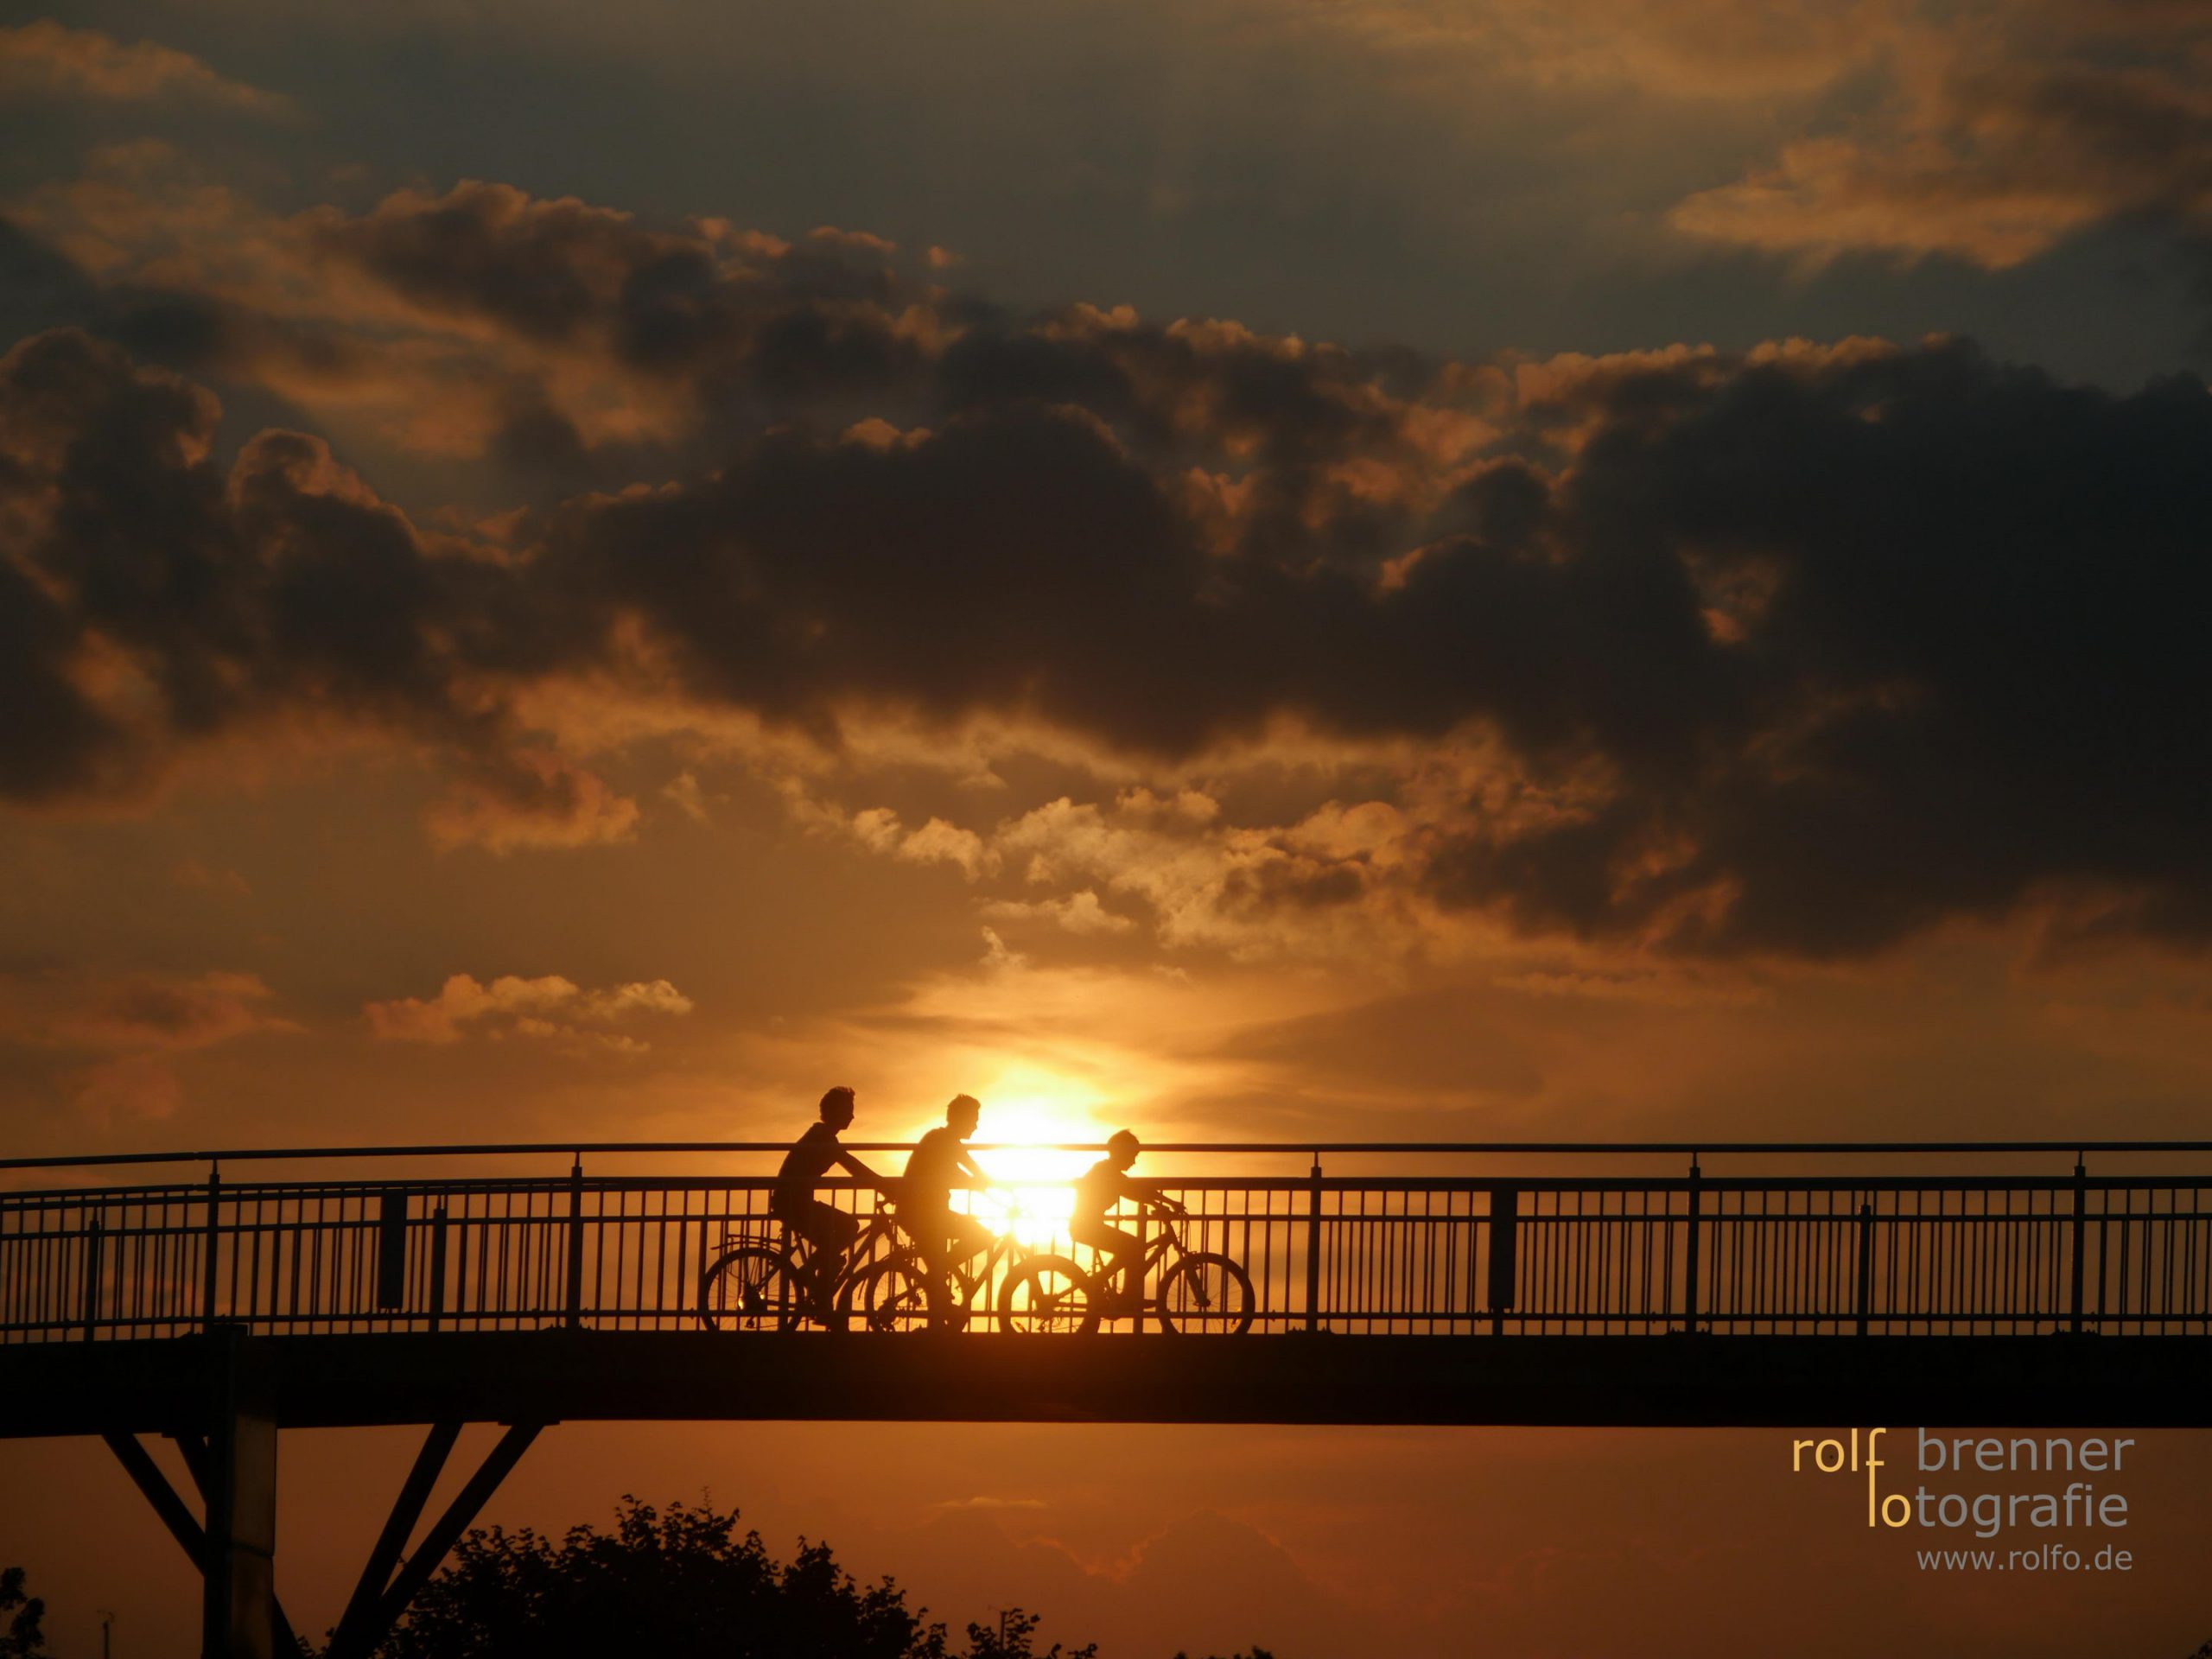 Fahrradfahrer auf der Sipplinger Fußgänger Brücke